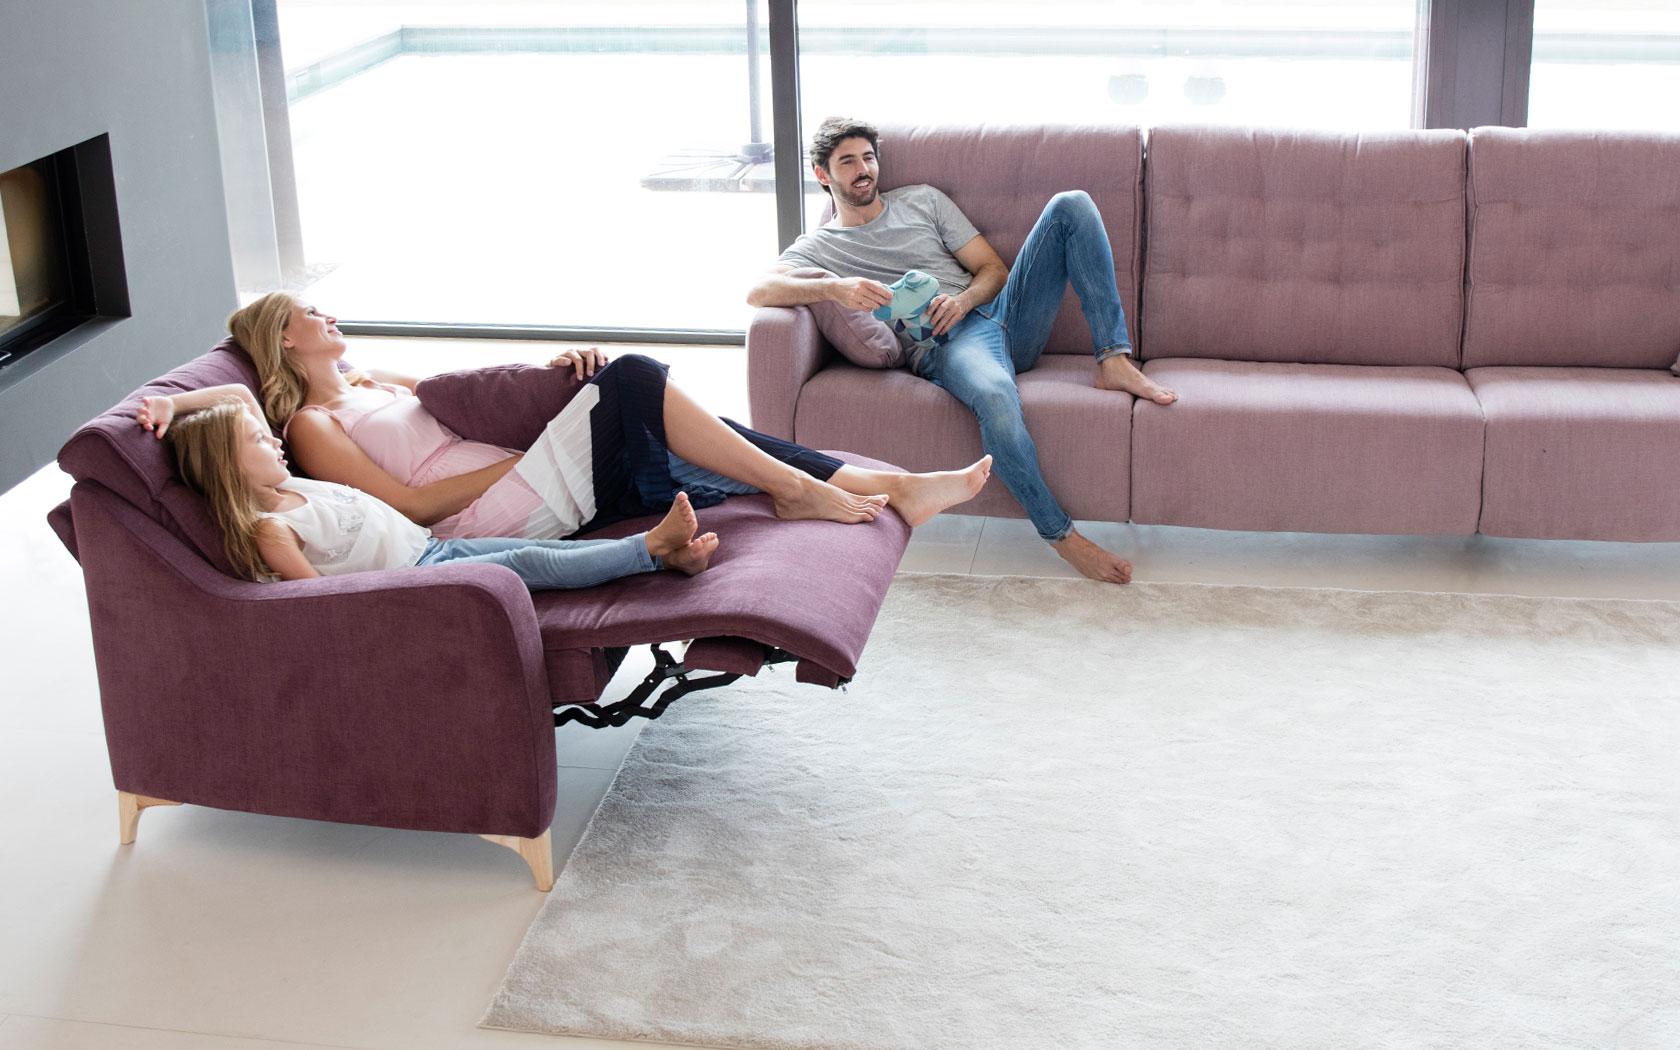 Avalon sofa relax 2019 02